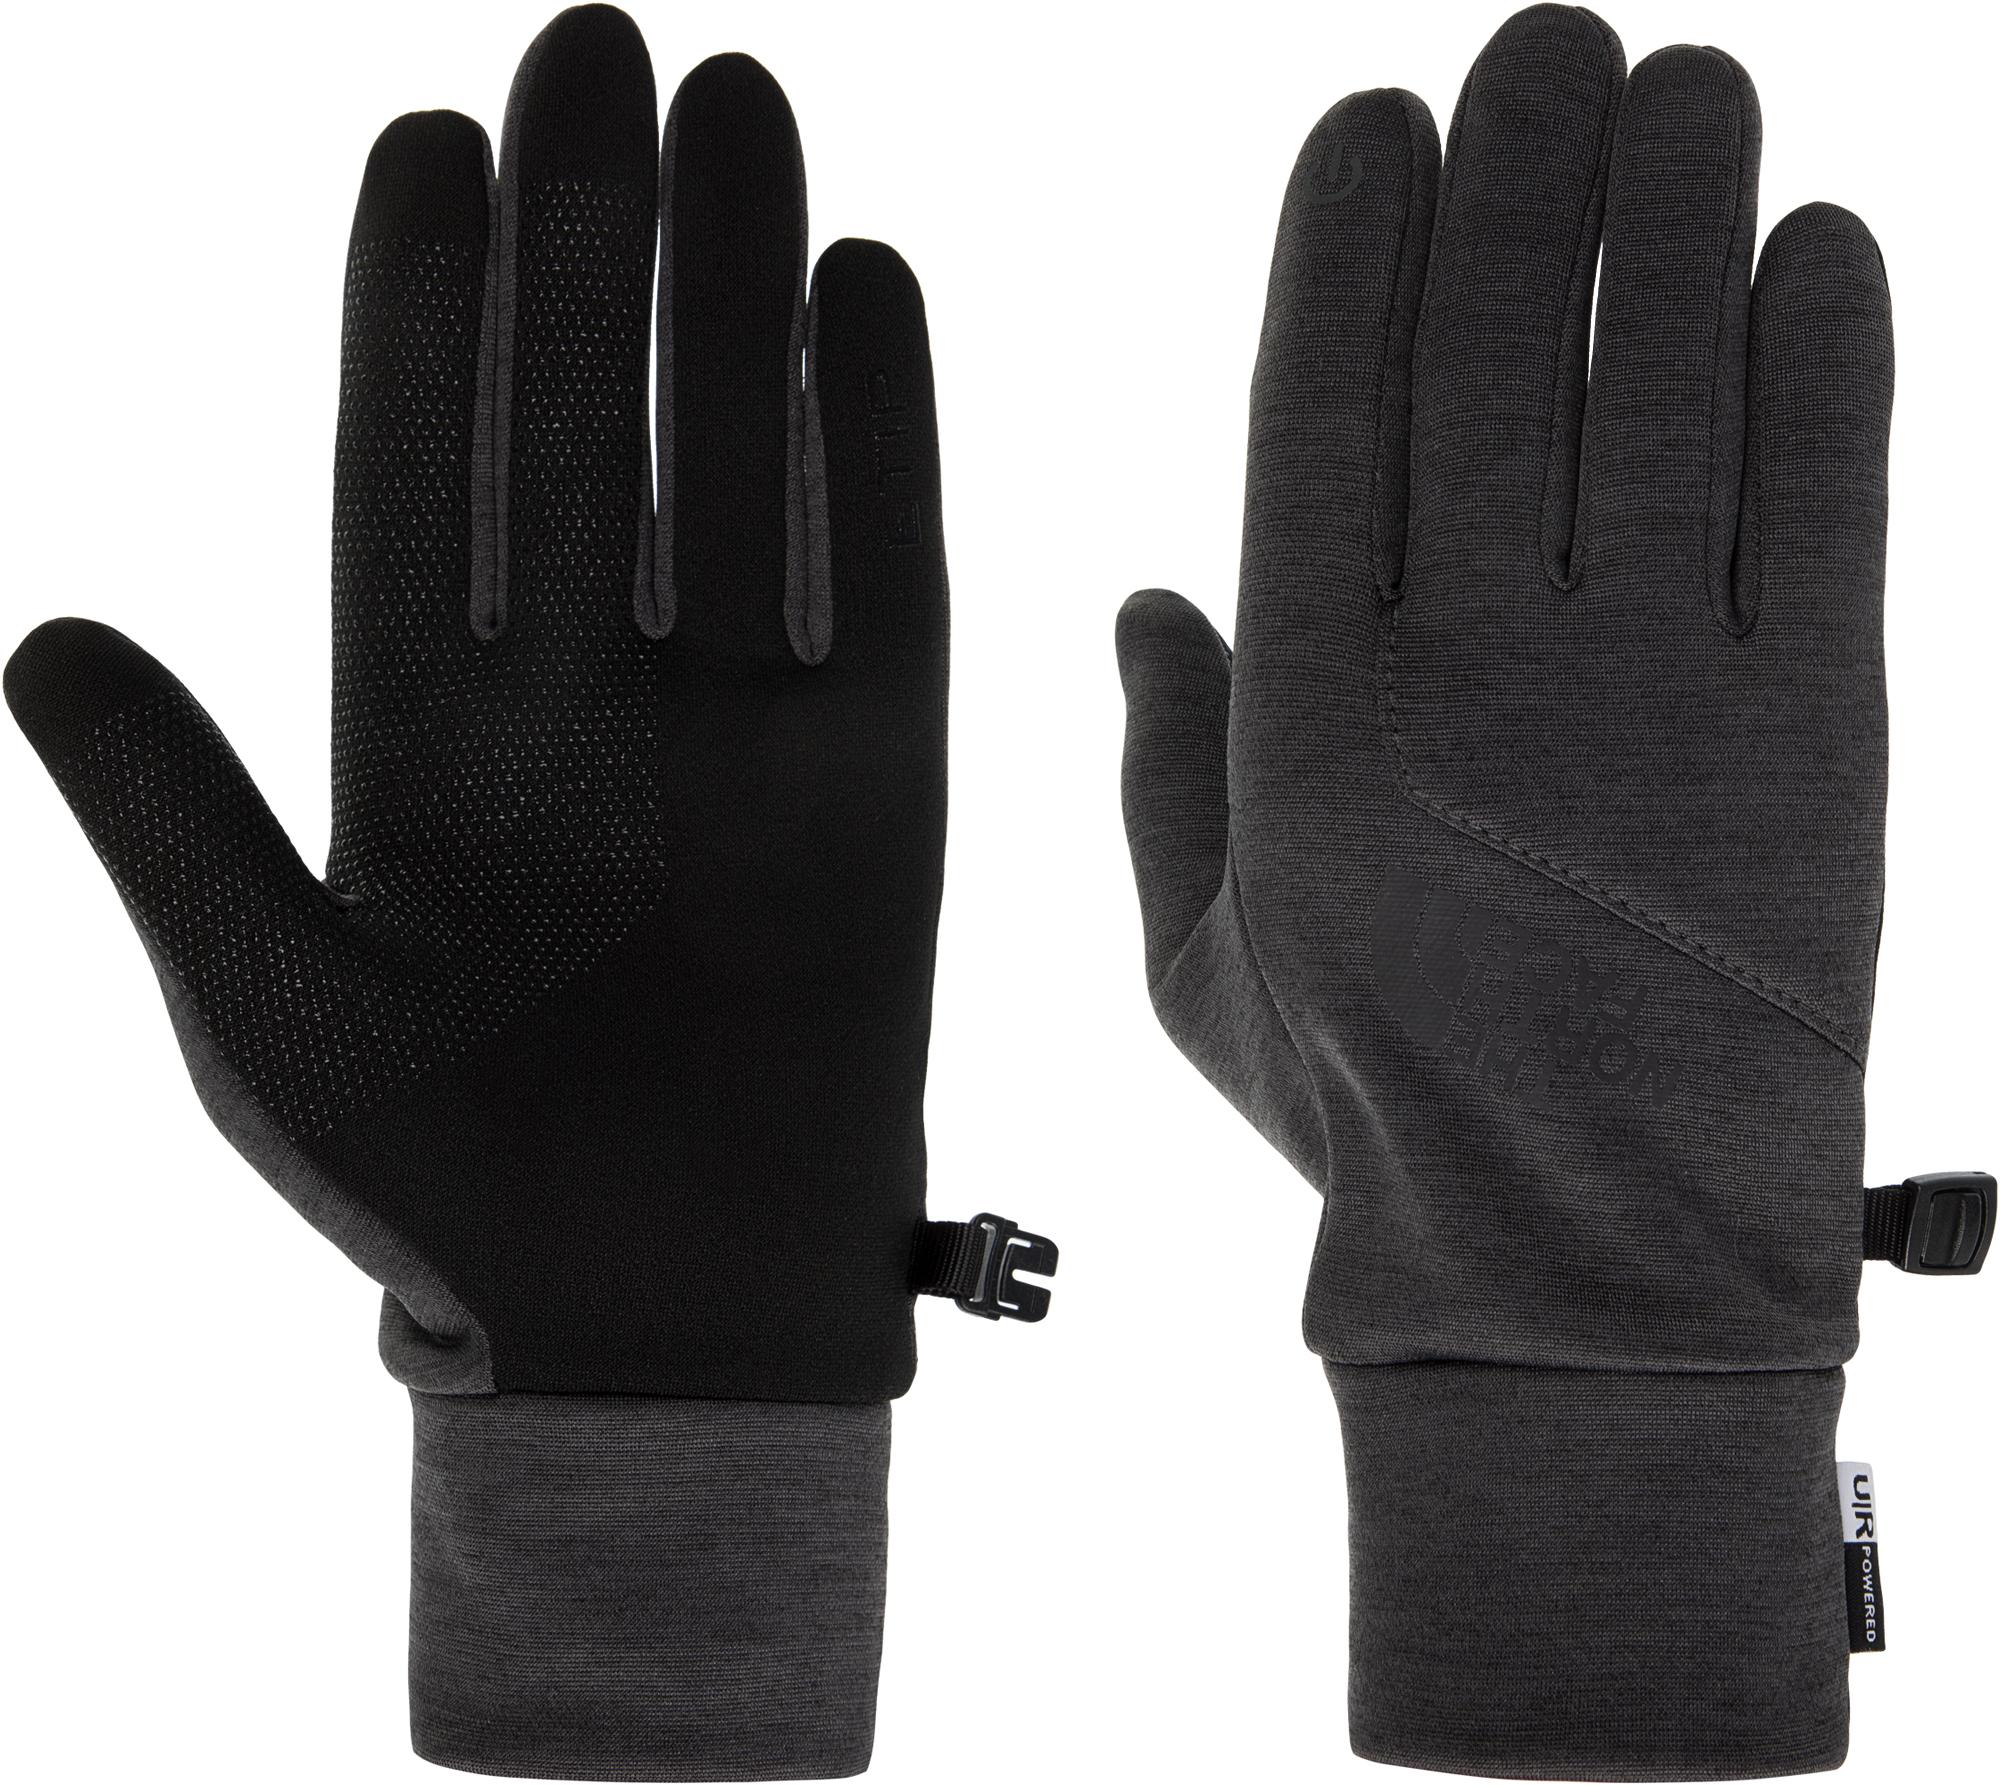 The North Face Перчатки женские Etip, размер 8,5